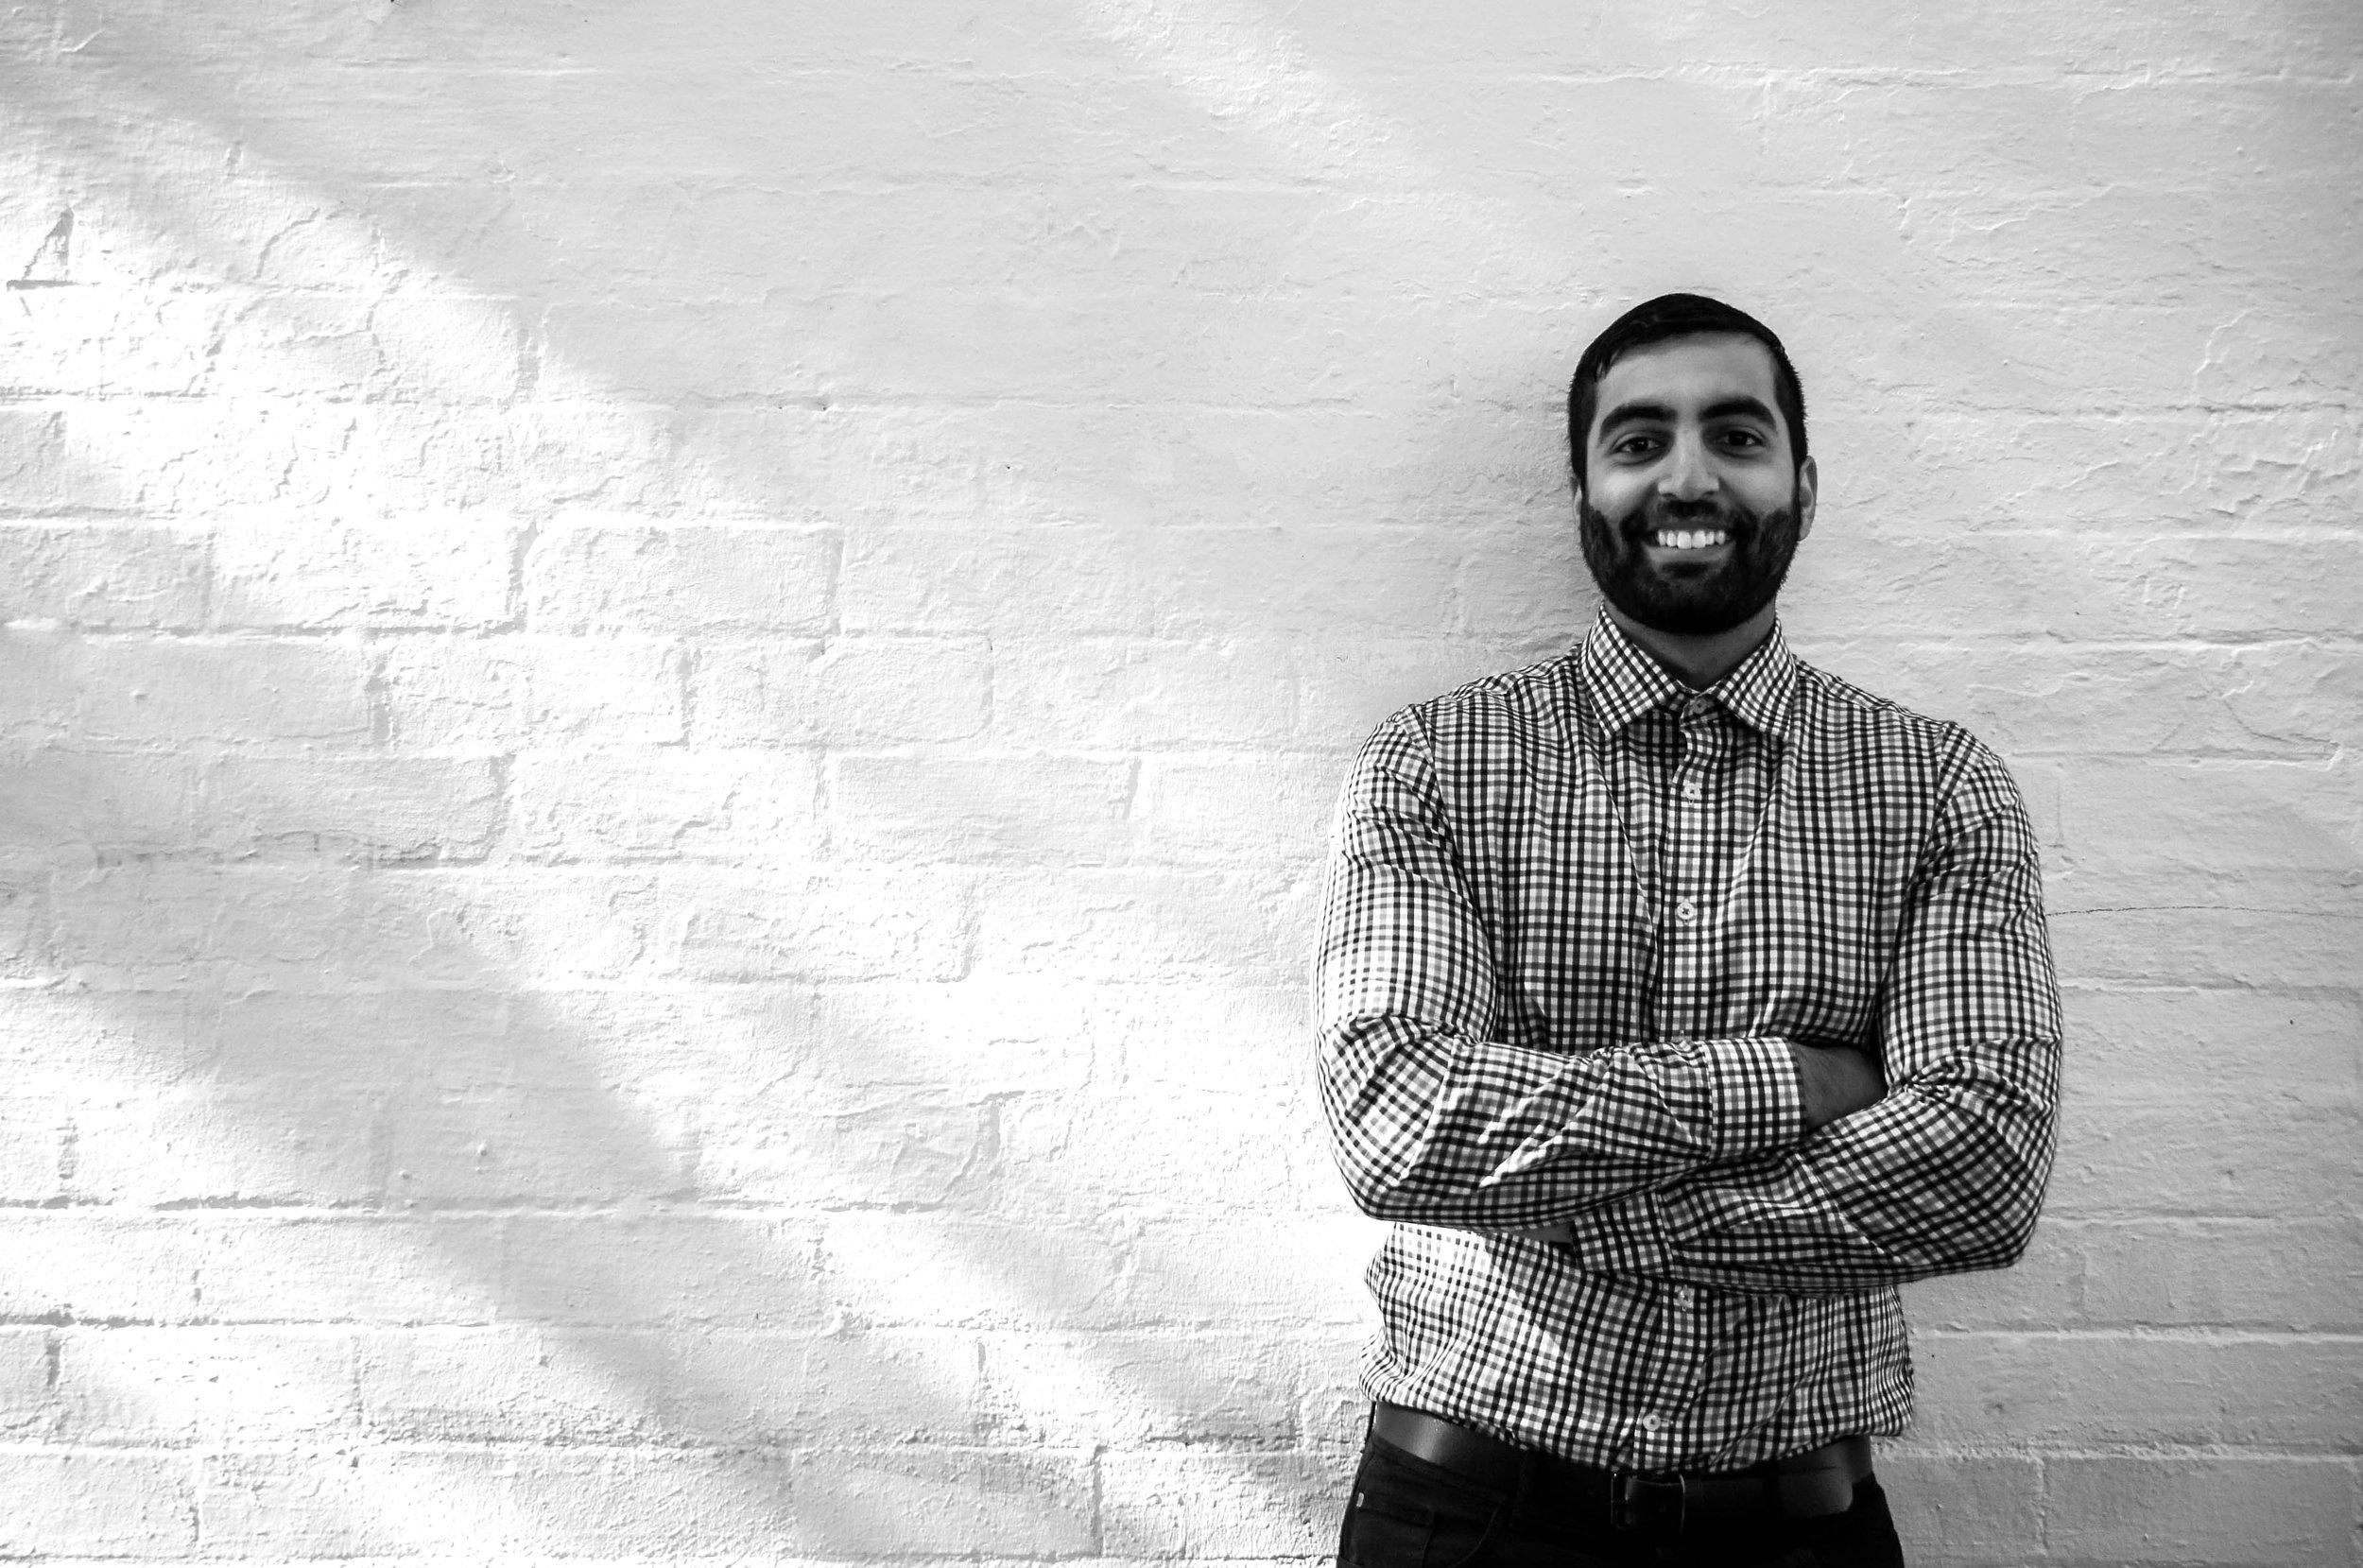 Jonathon Charan | Graduate of Architecture